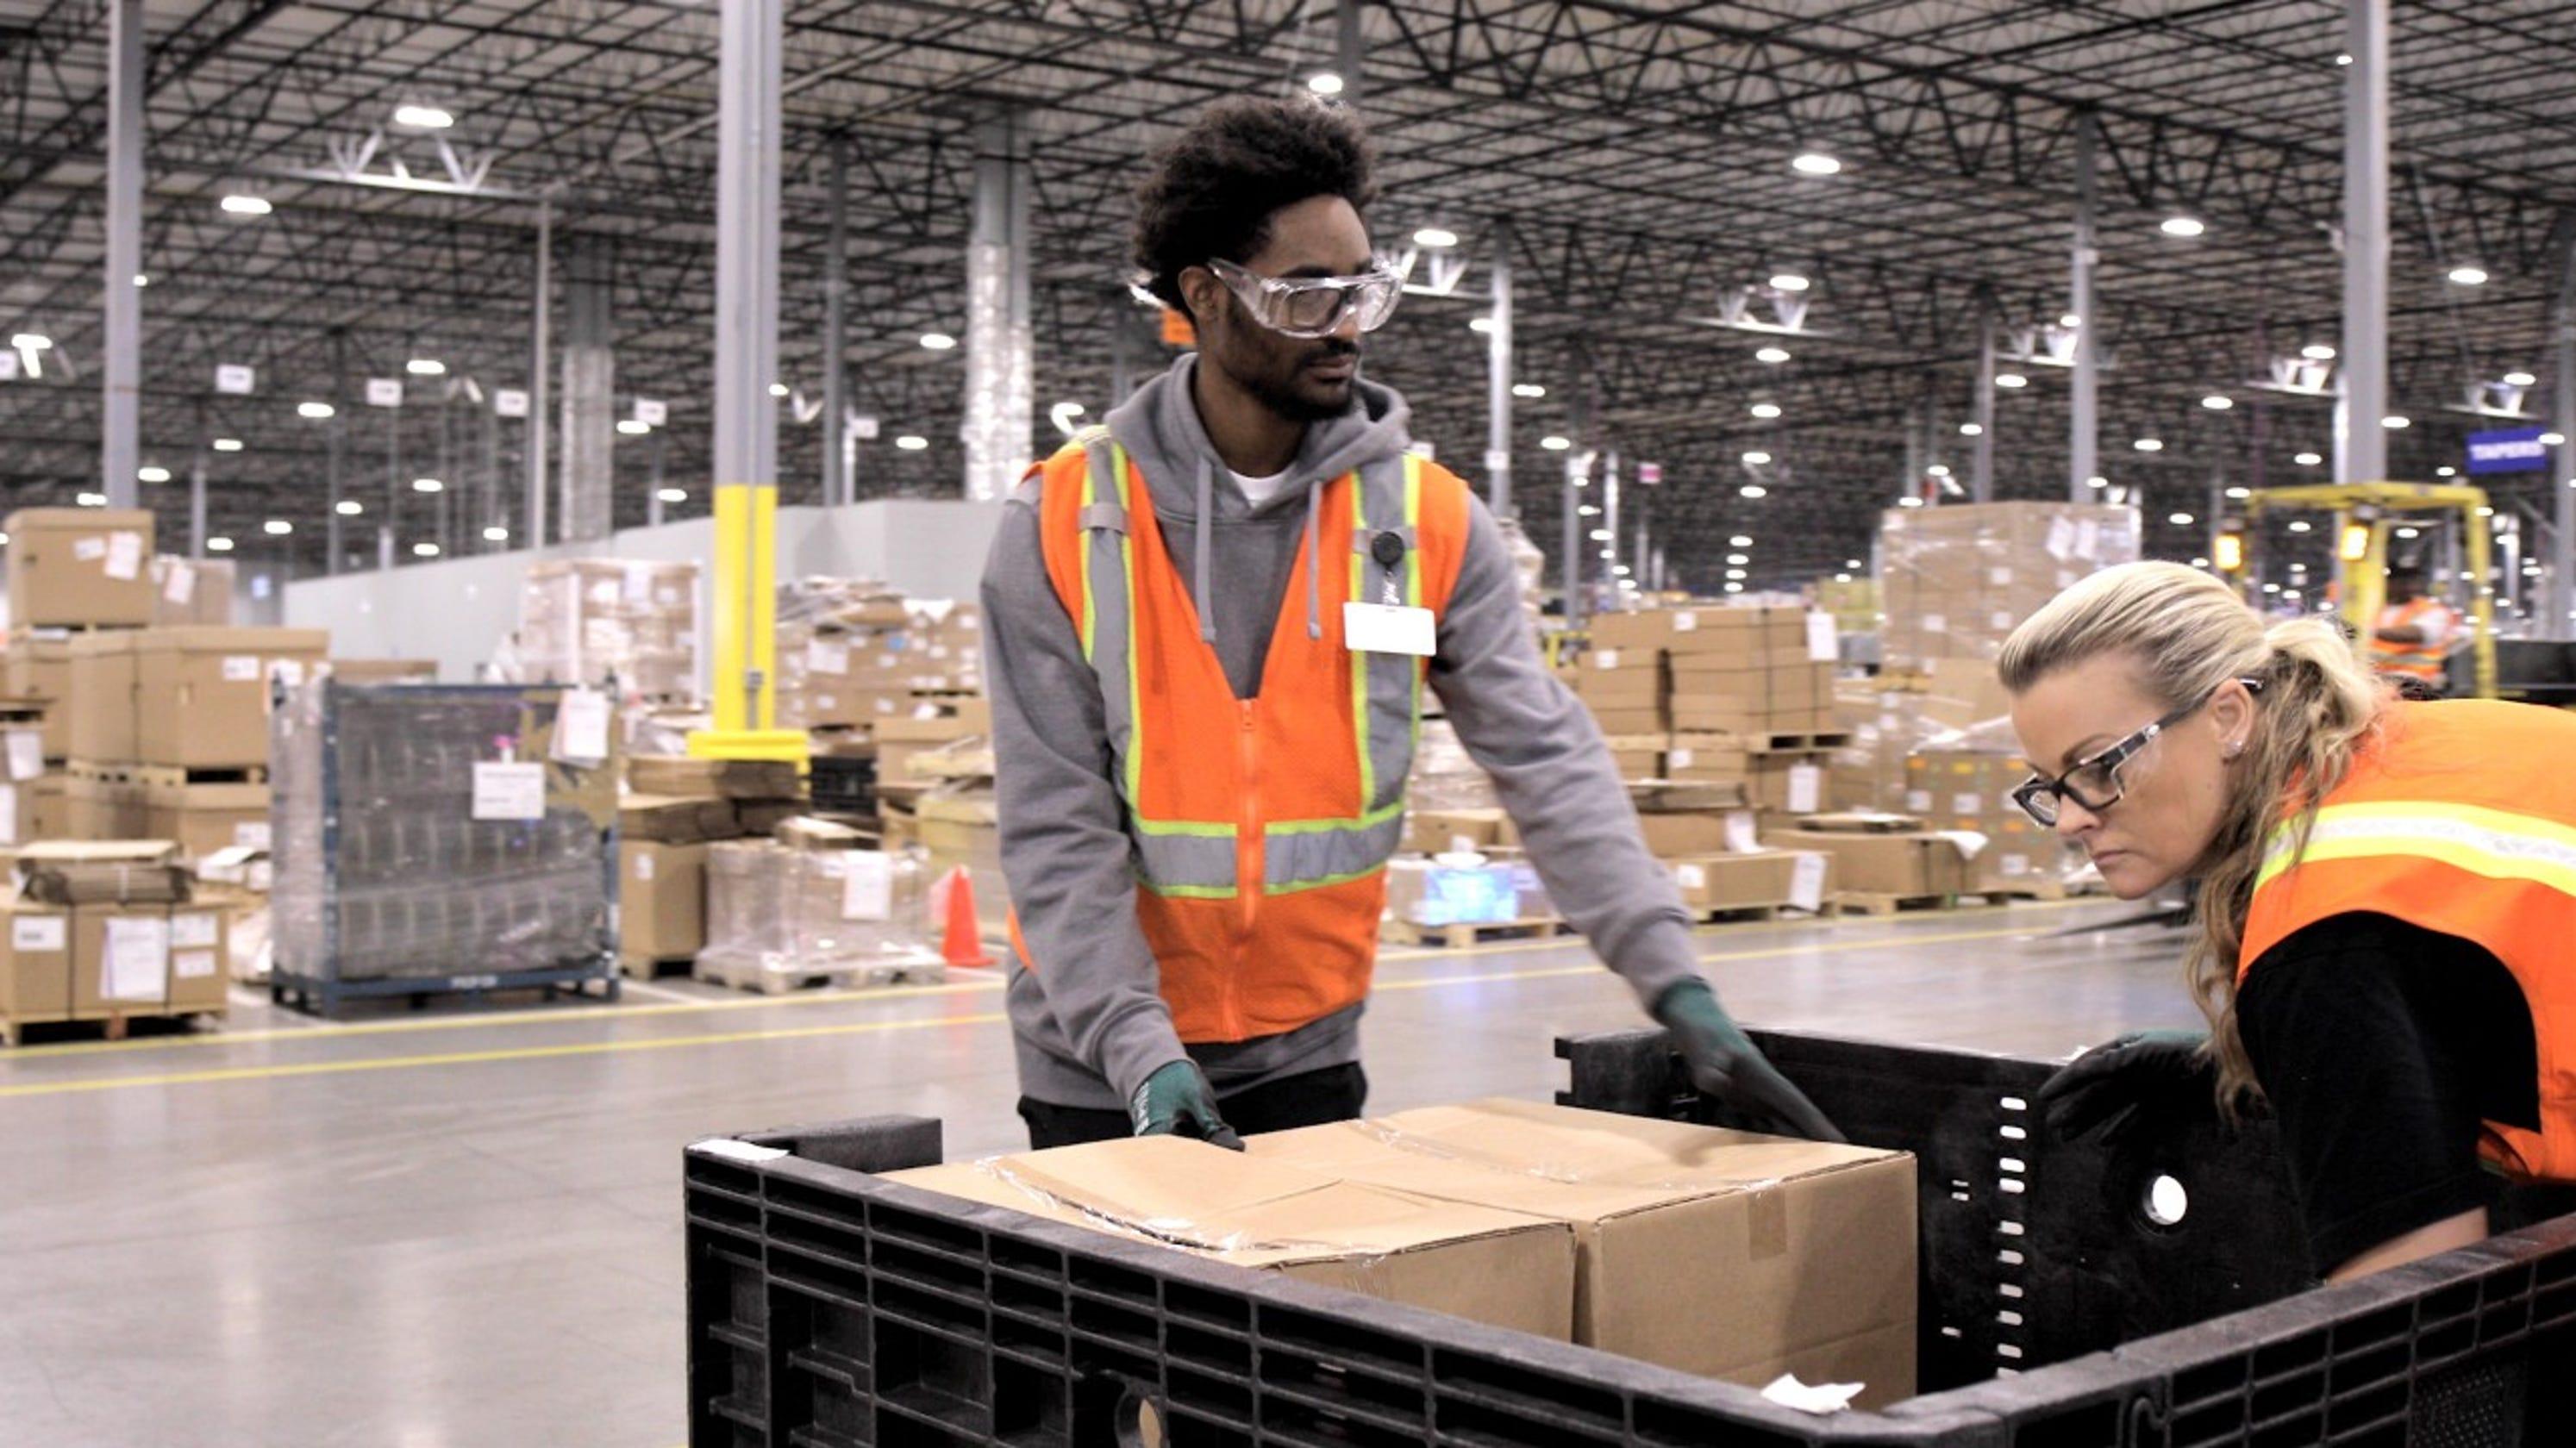 GM opens $65M new parts processing center, keeping jobs near Flint